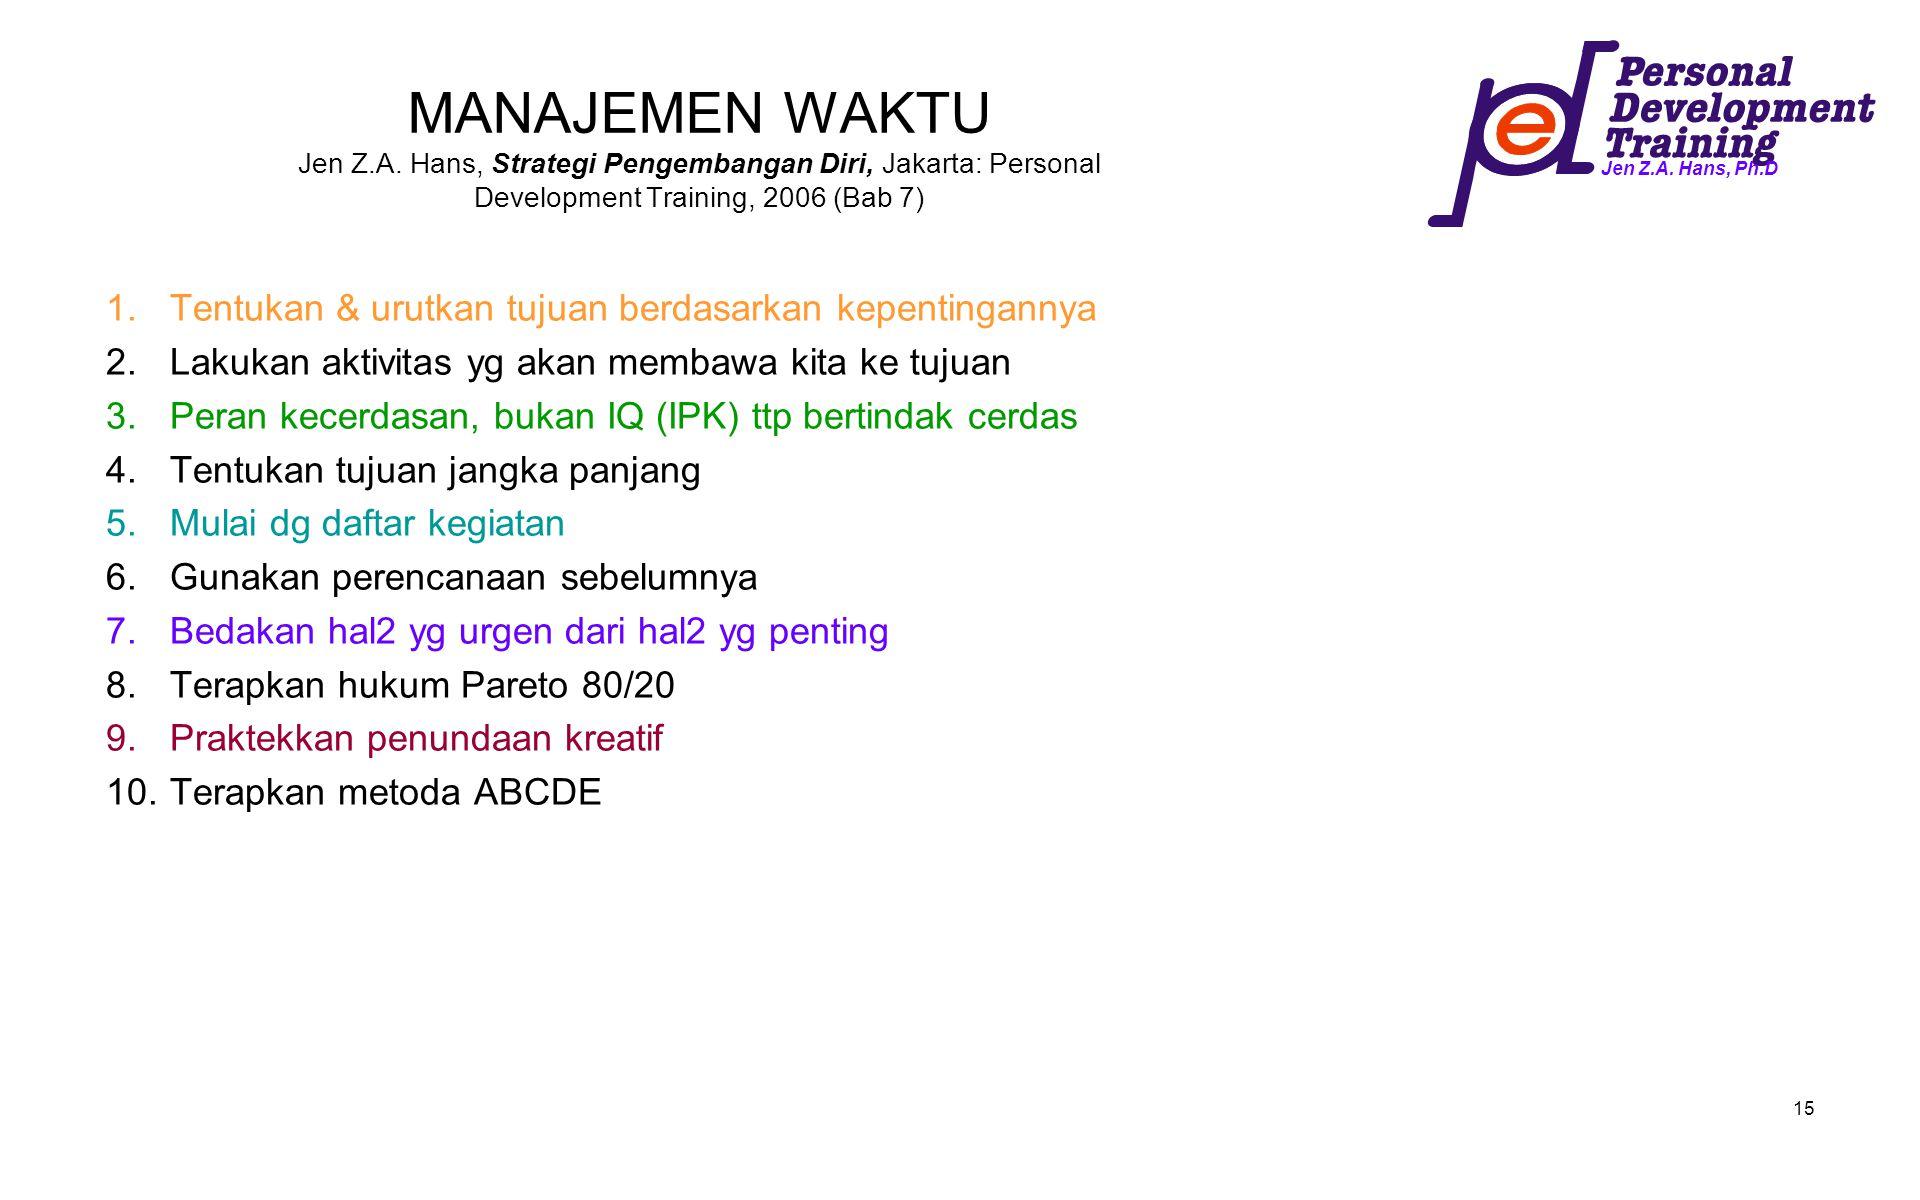 Jen Z.A. Hans, Ph.D 15 MANAJEMEN WAKTU Jen Z.A. Hans, Strategi Pengembangan Diri, Jakarta: Personal Development Training, 2006 (Bab 7) 1.Tentukan & ur